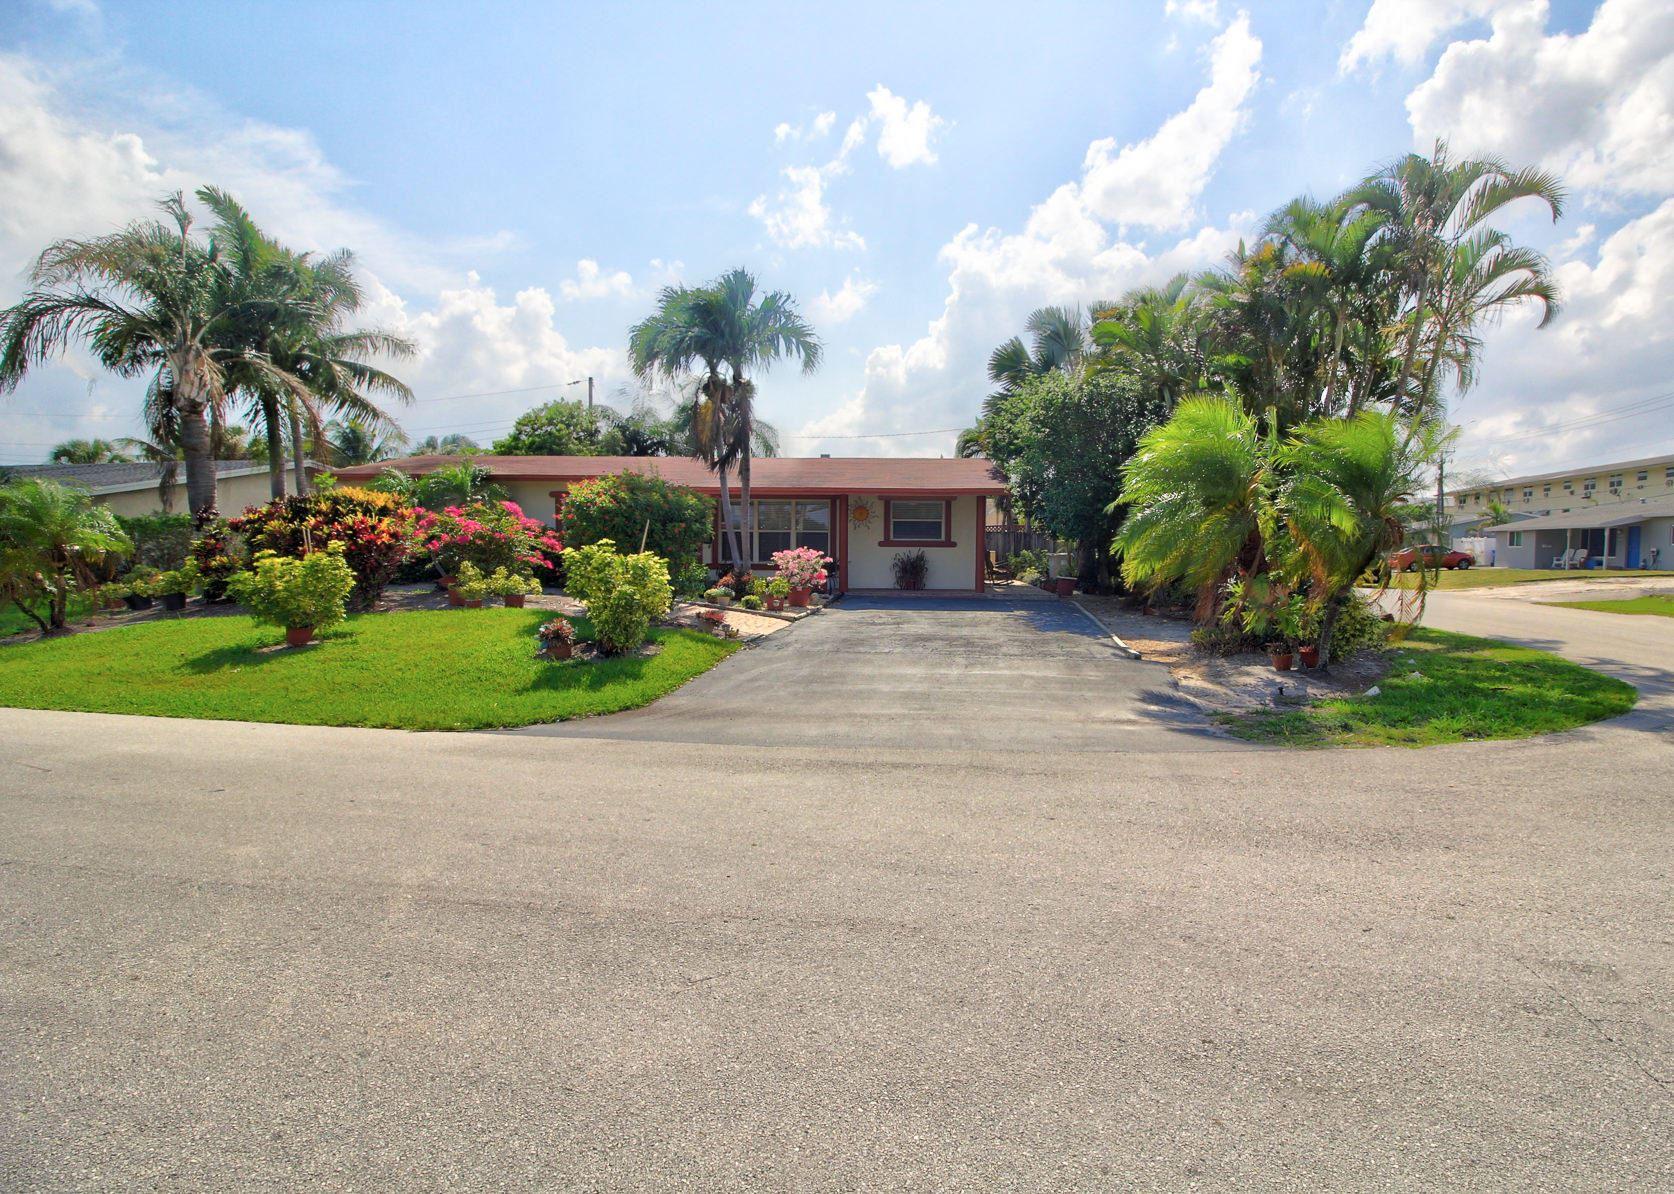 Photo of 3451 NE 14th Terrace, Pompano Beach, FL 33064 (MLS # RX-10714805)